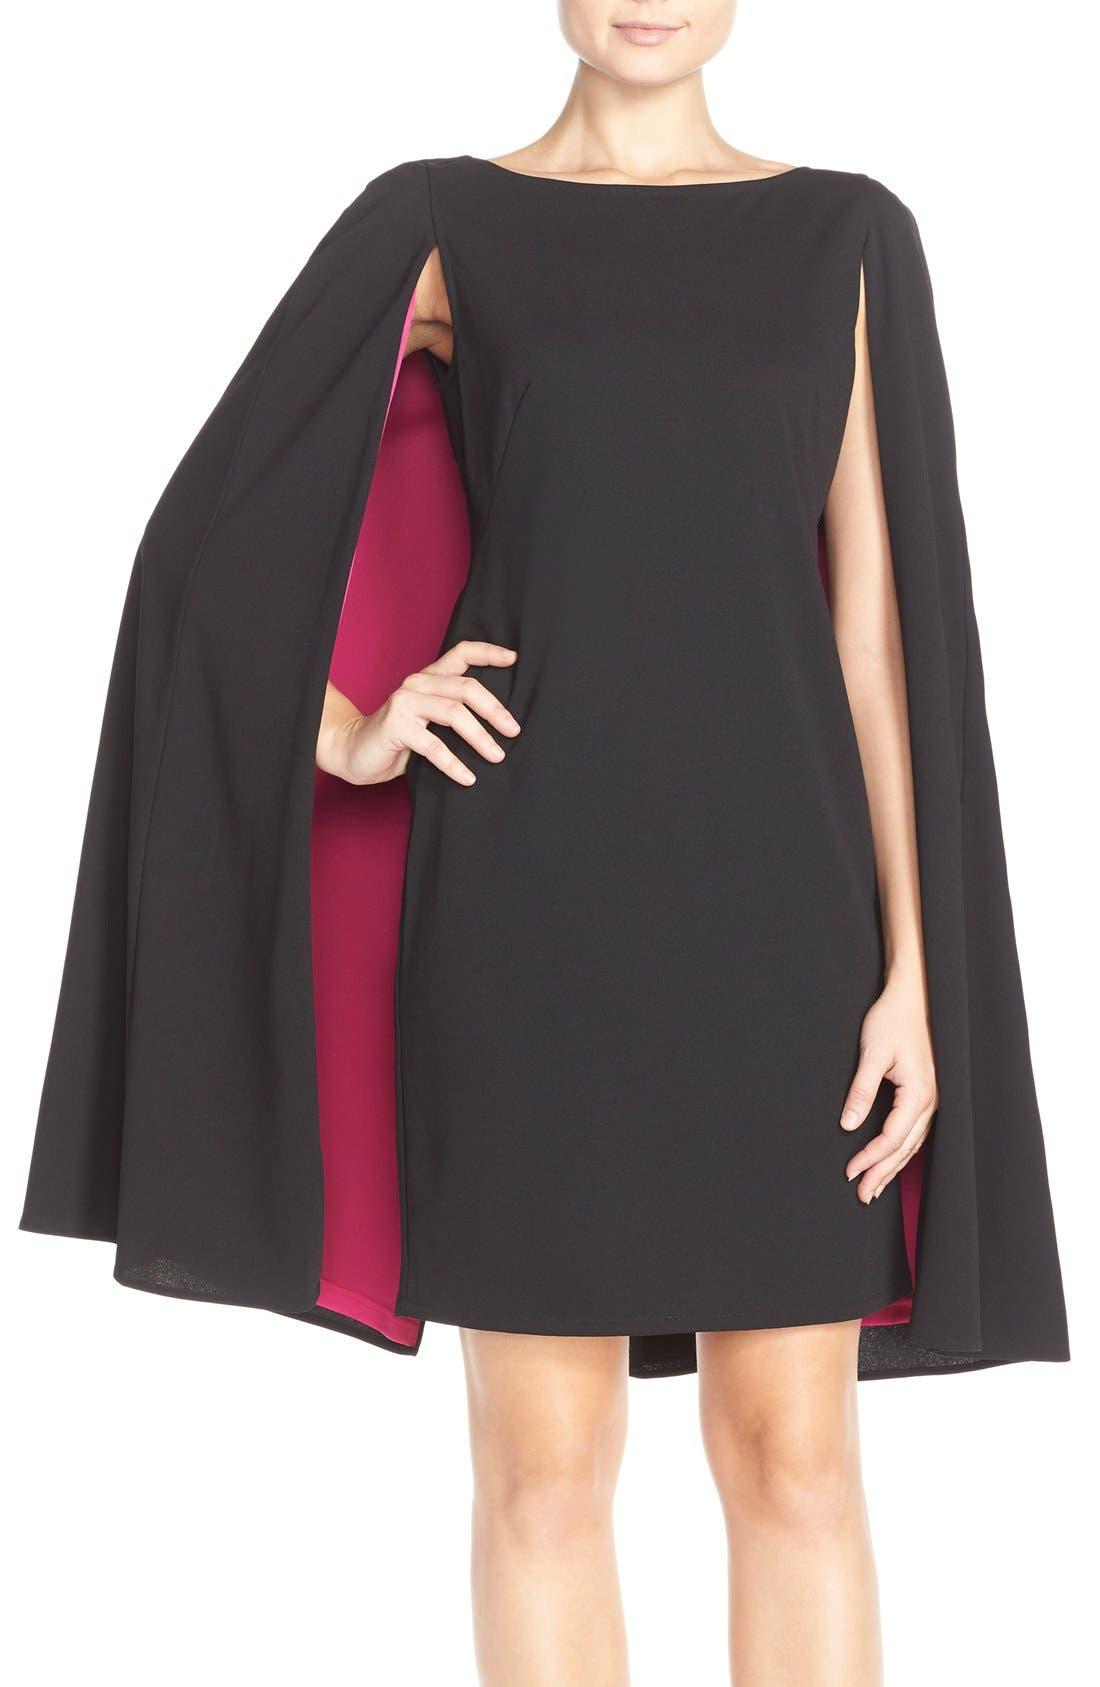 Main Image - Adrianna Papell Cape Sheath Crepe Dress